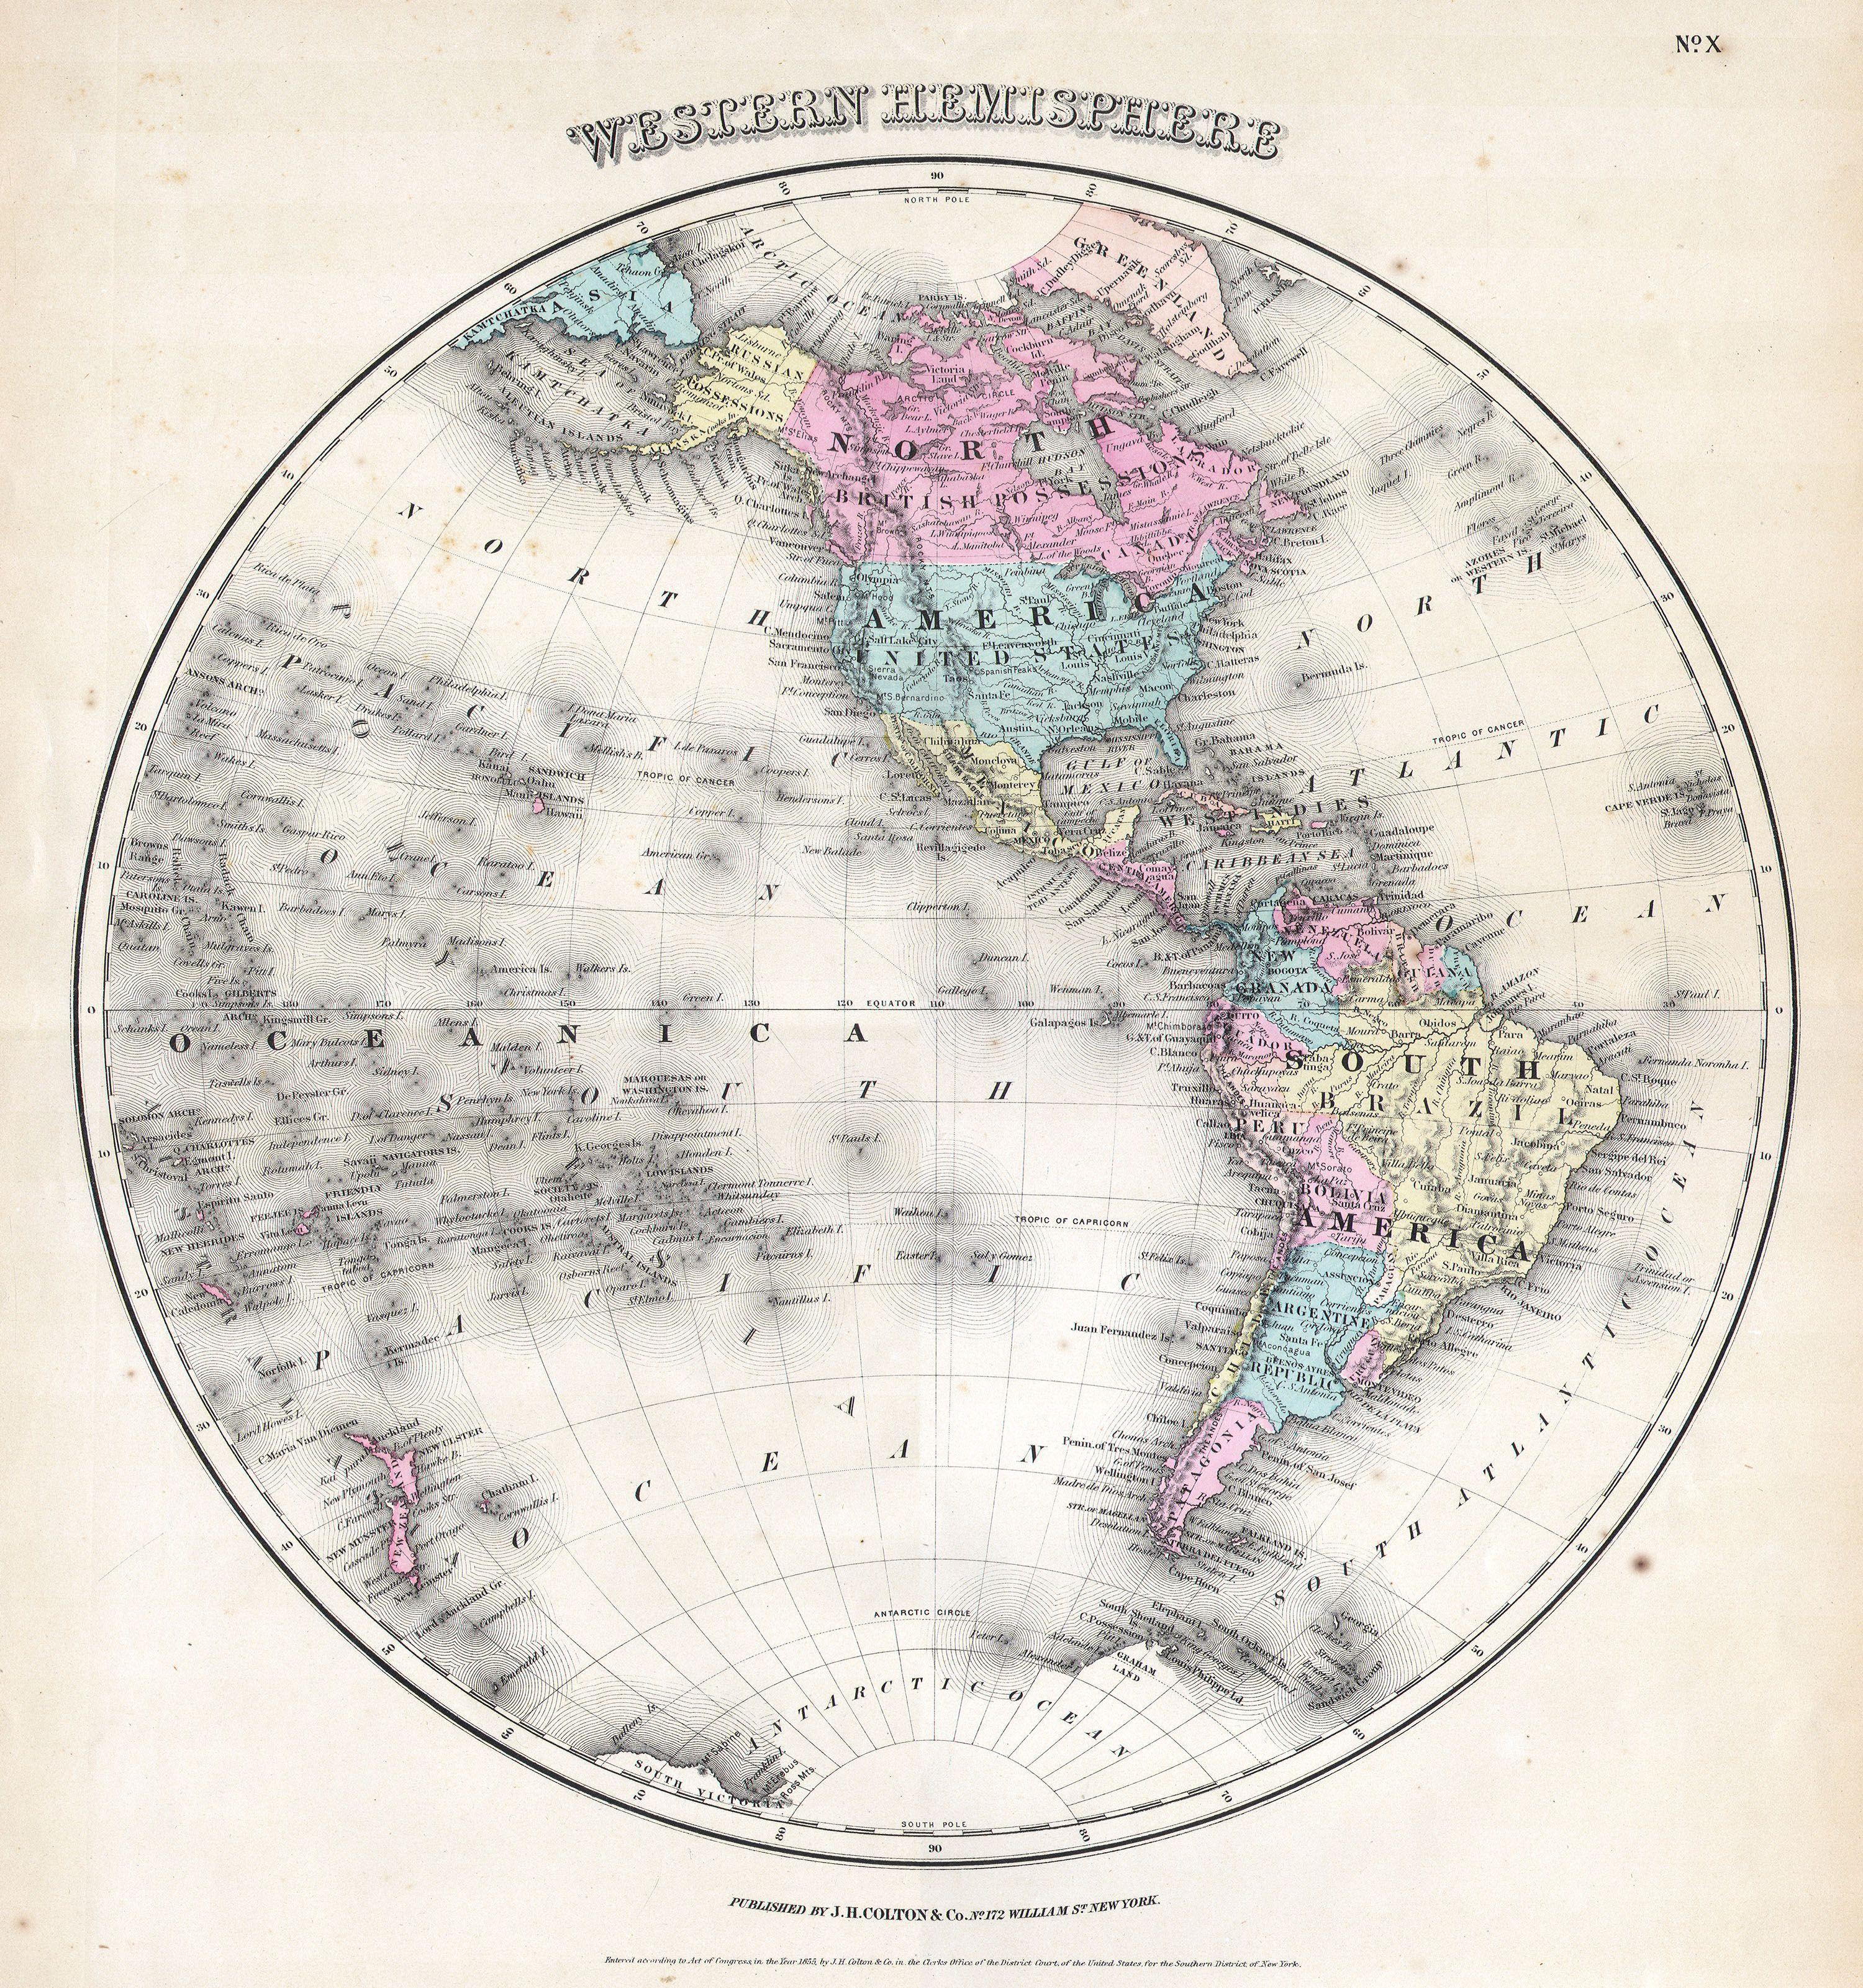 image regarding Western Hemisphere Map Printable known as Document:1855 Colton Map of the Western Hemisphere